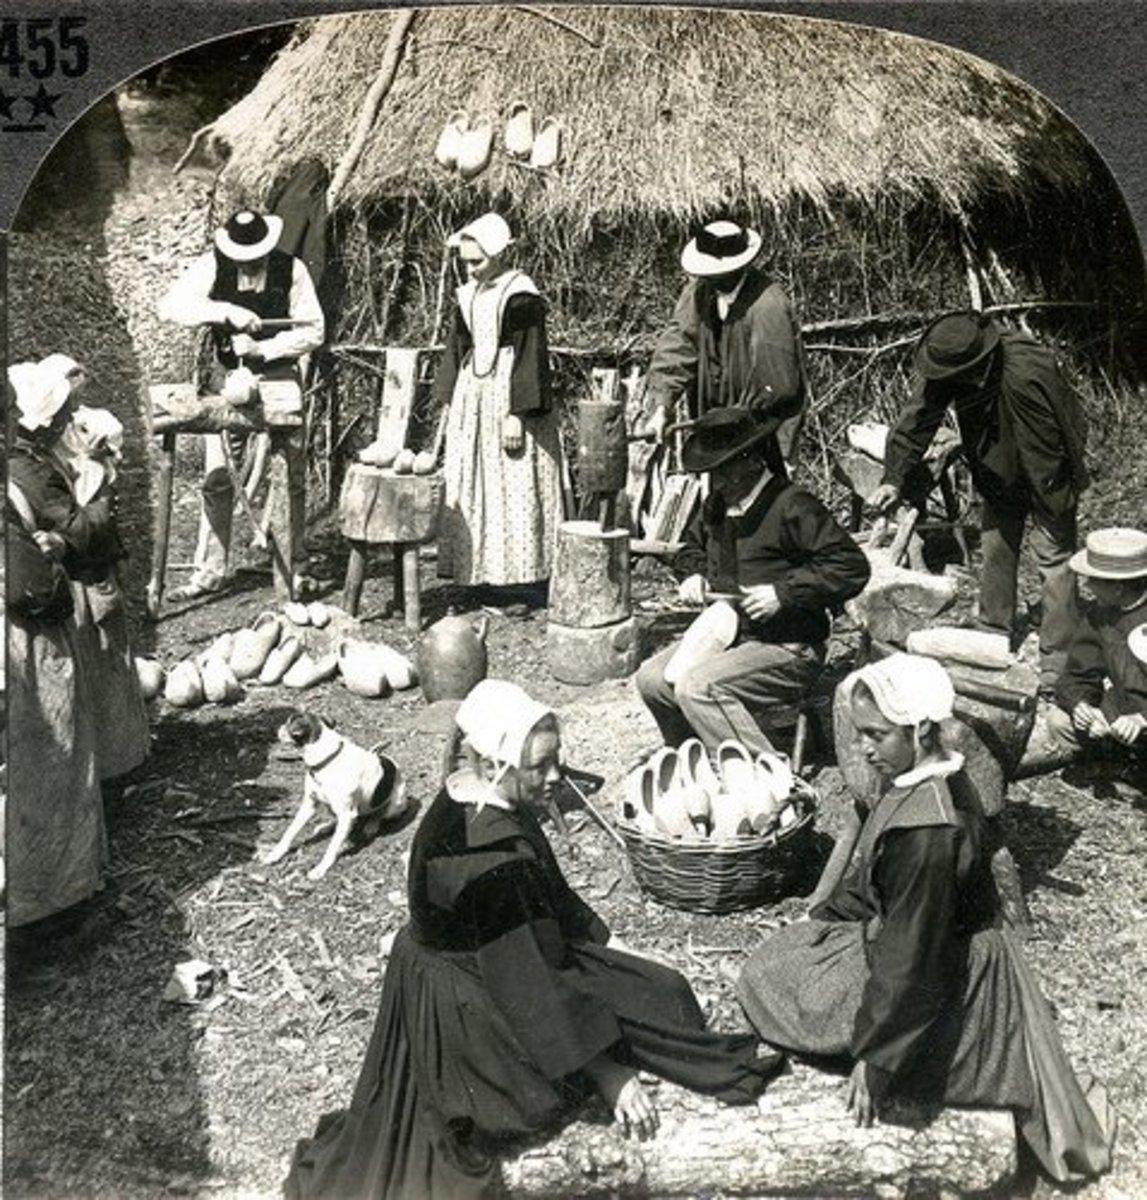 Breton peasants making sabots or wooden shoes.